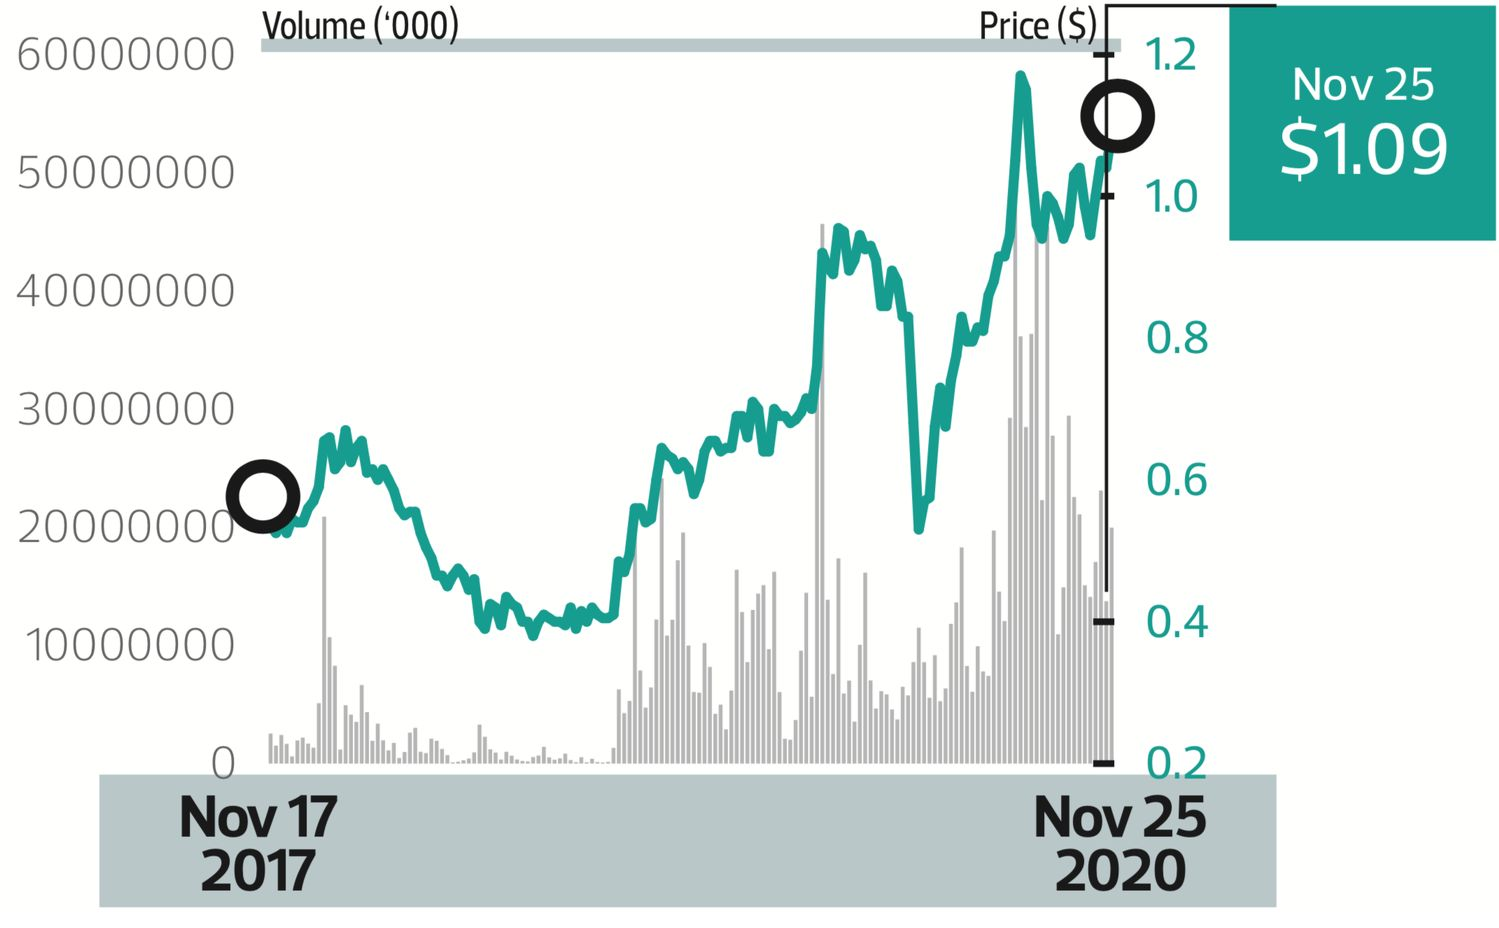 Price target: - THE EDGE SINGAPORE